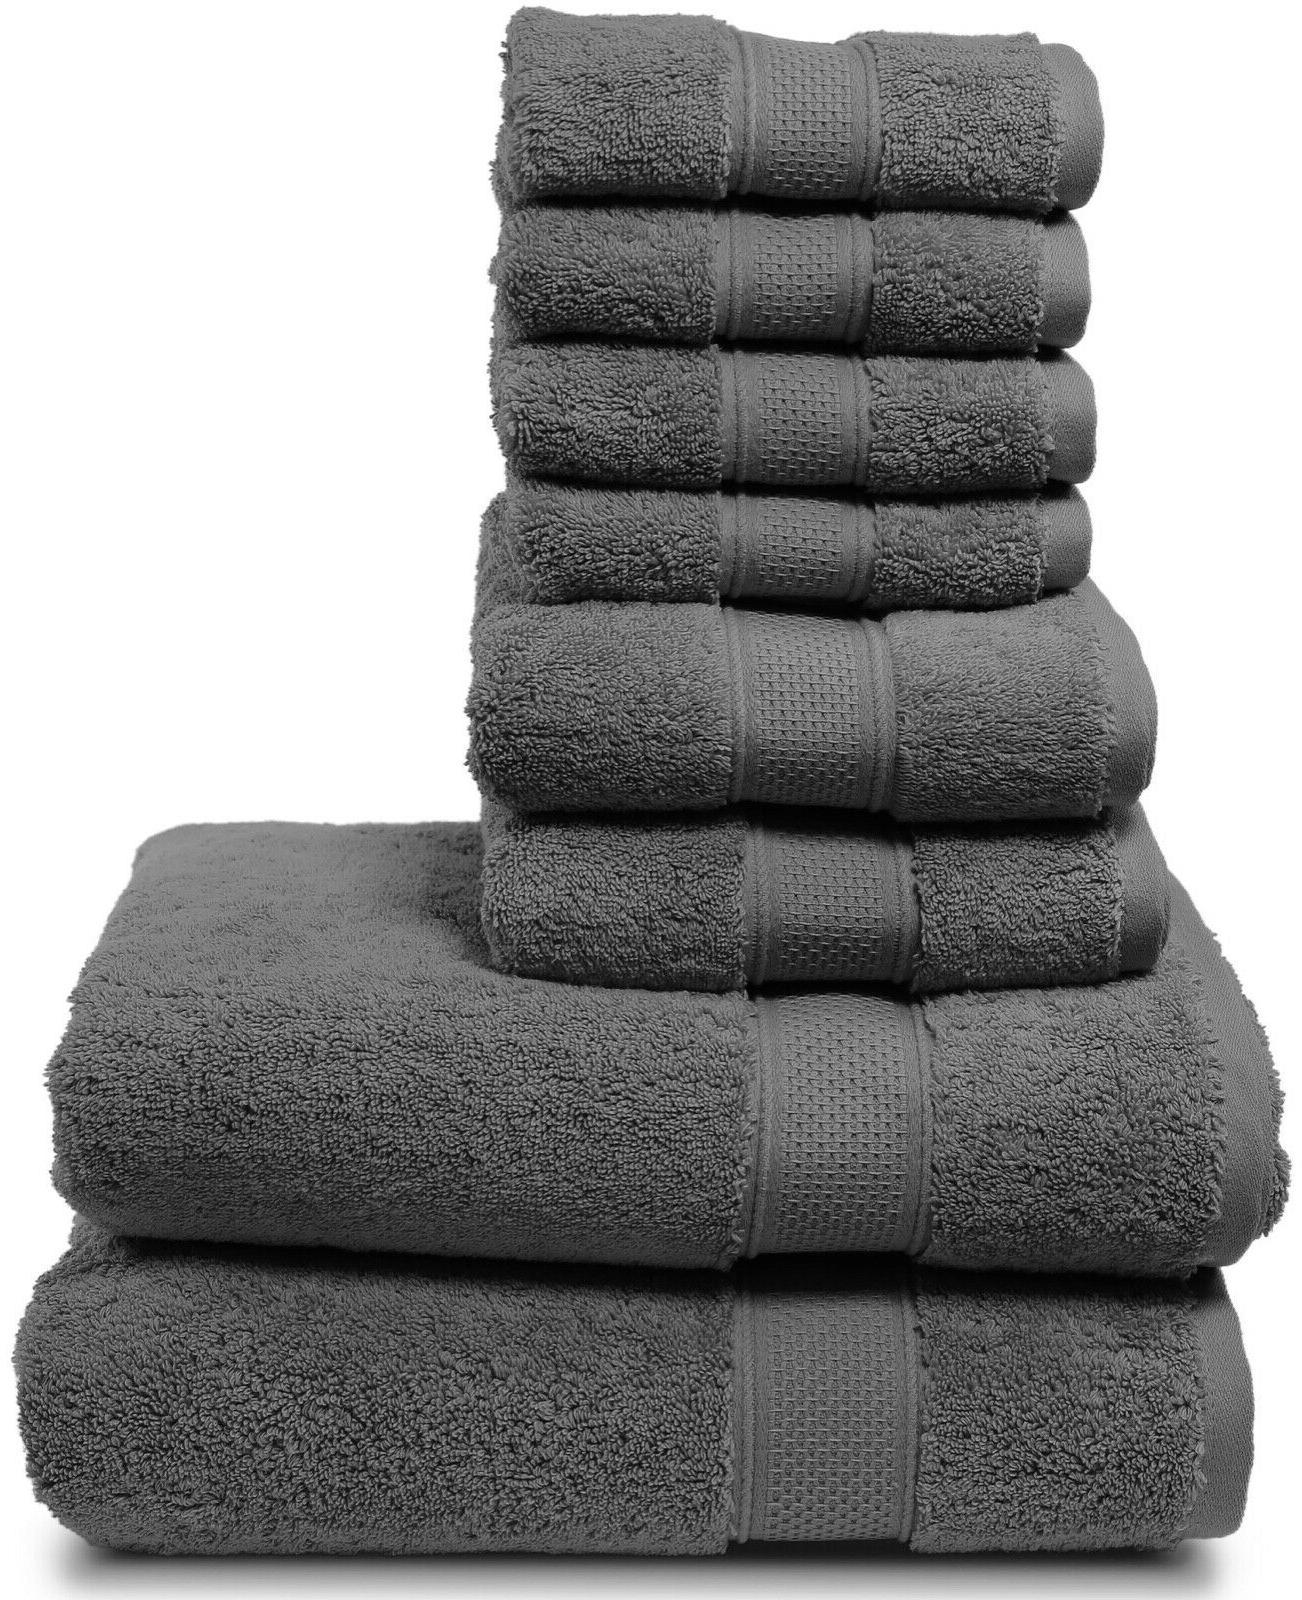 Towel - Large Bath Towel Hand Towel Maura